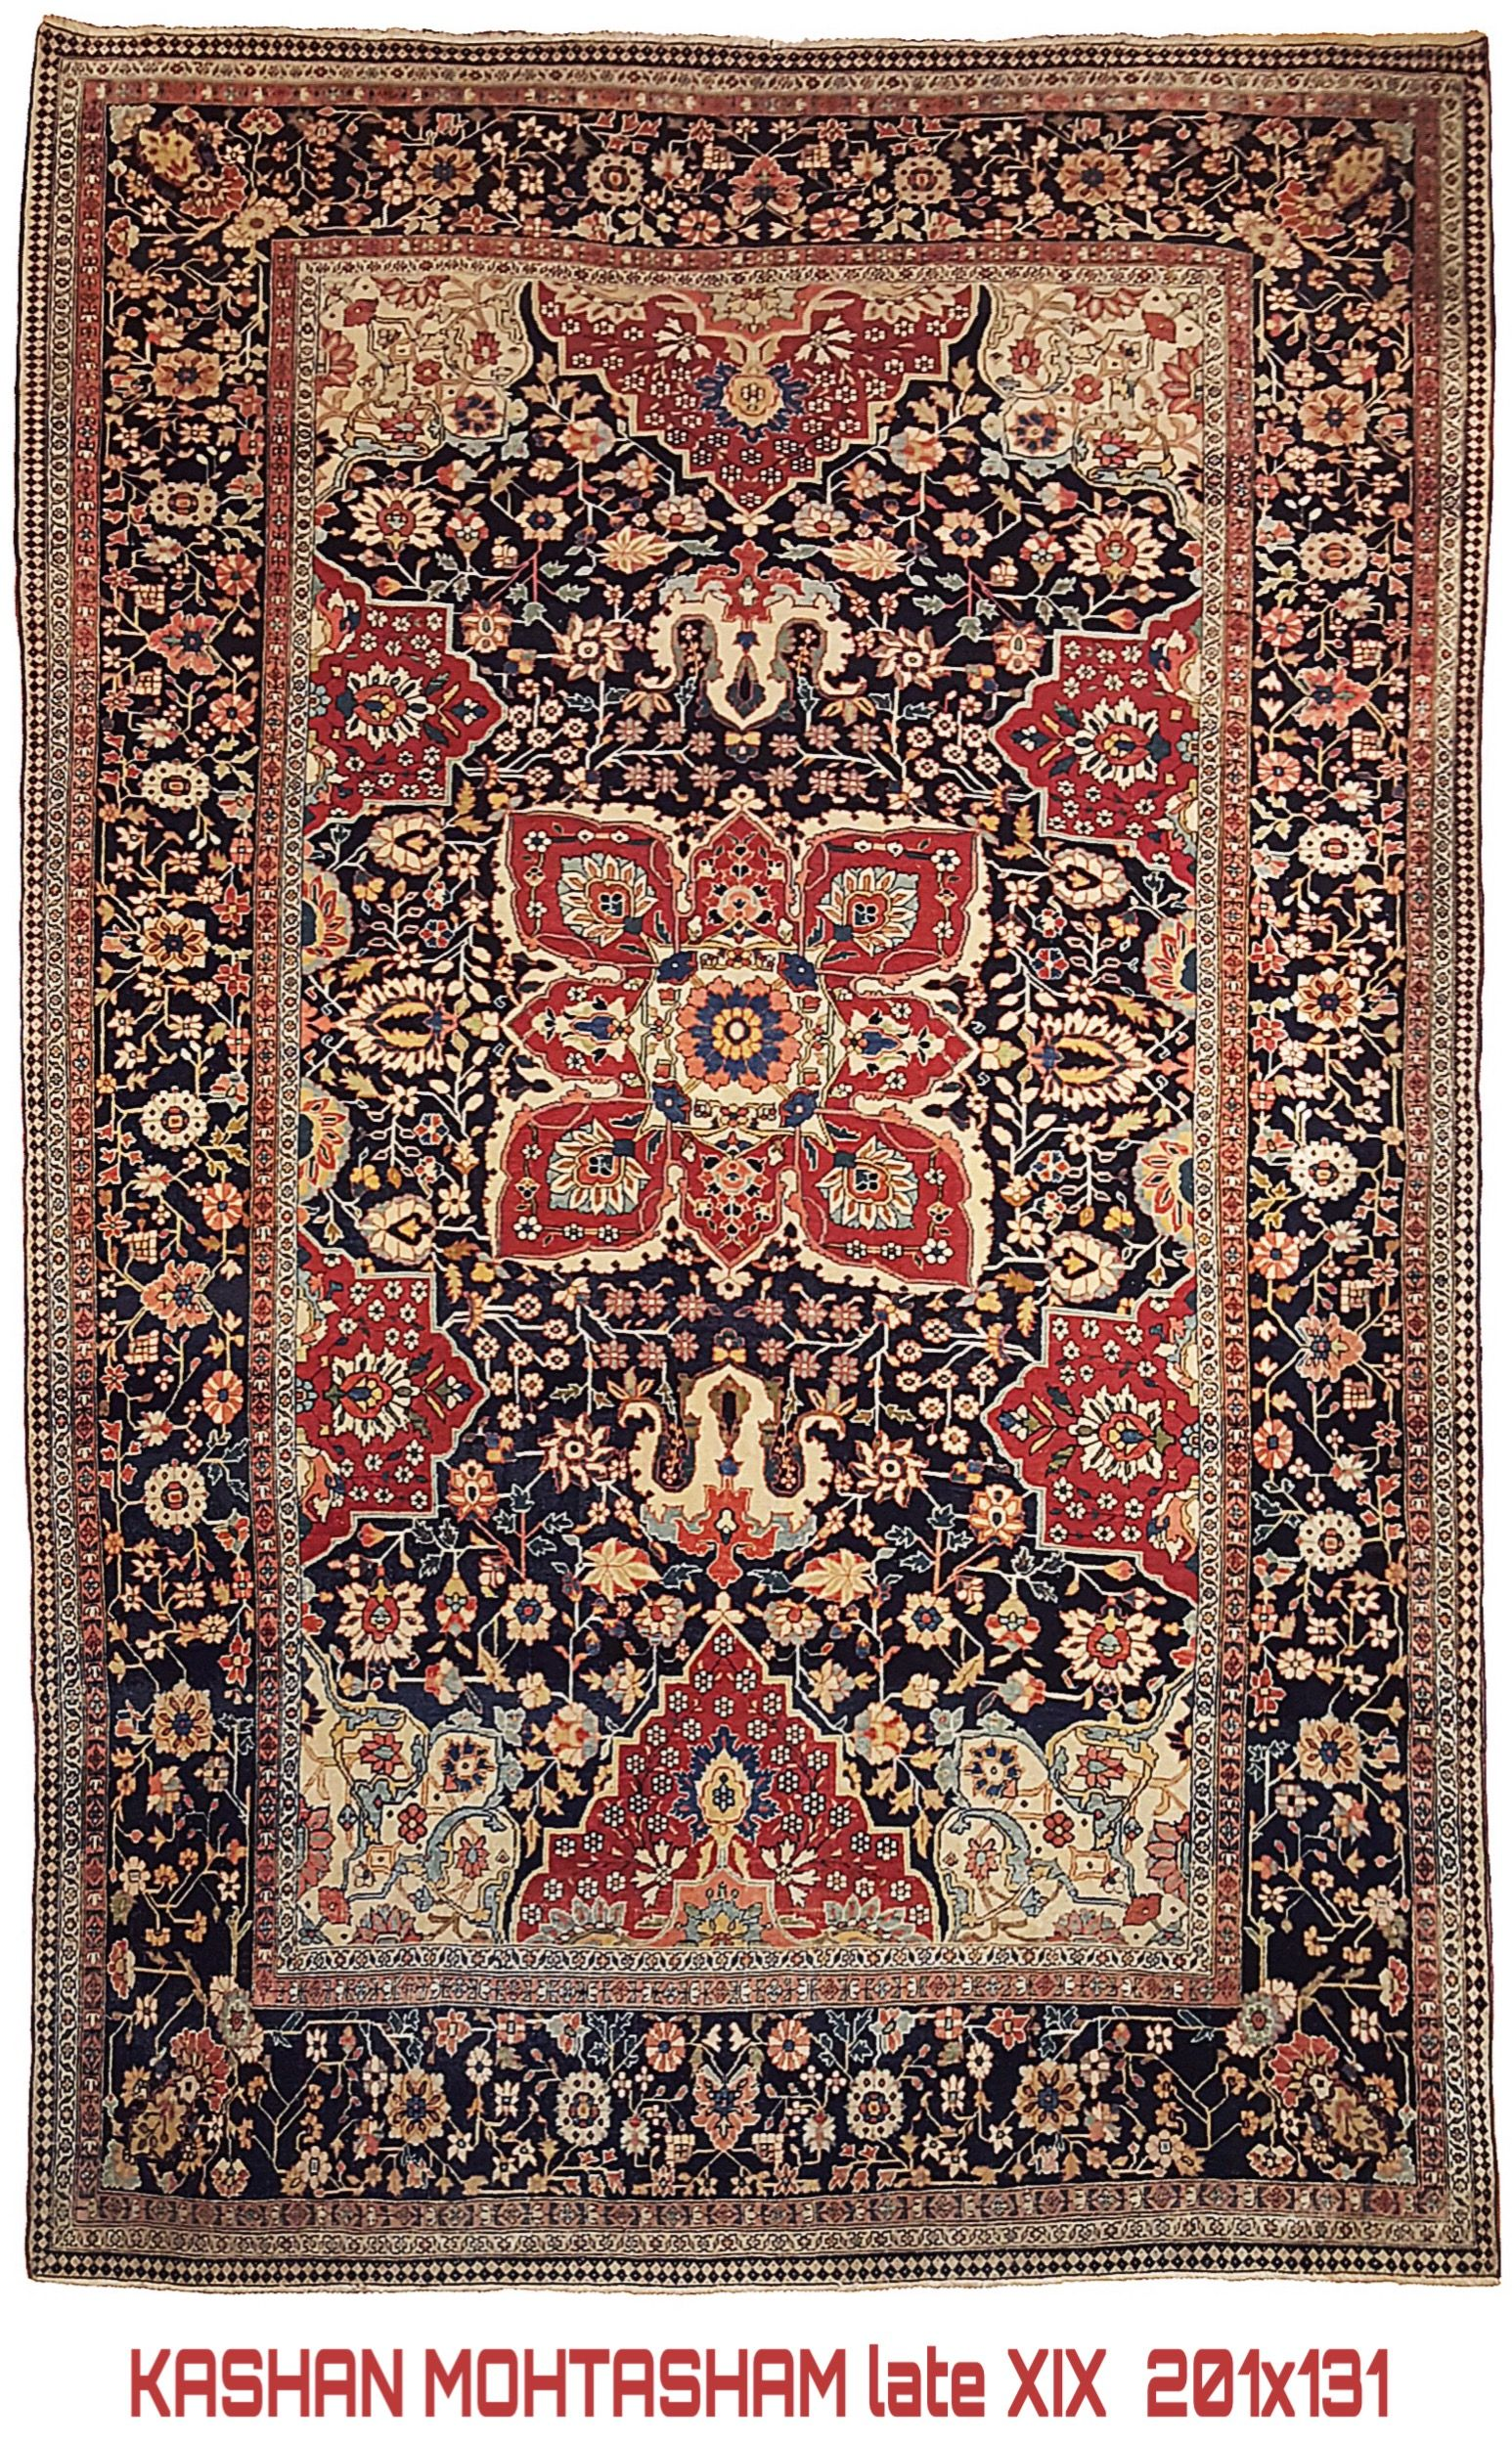 Mohtasham World Class Kashan Carpet 1890 ca. 201x134